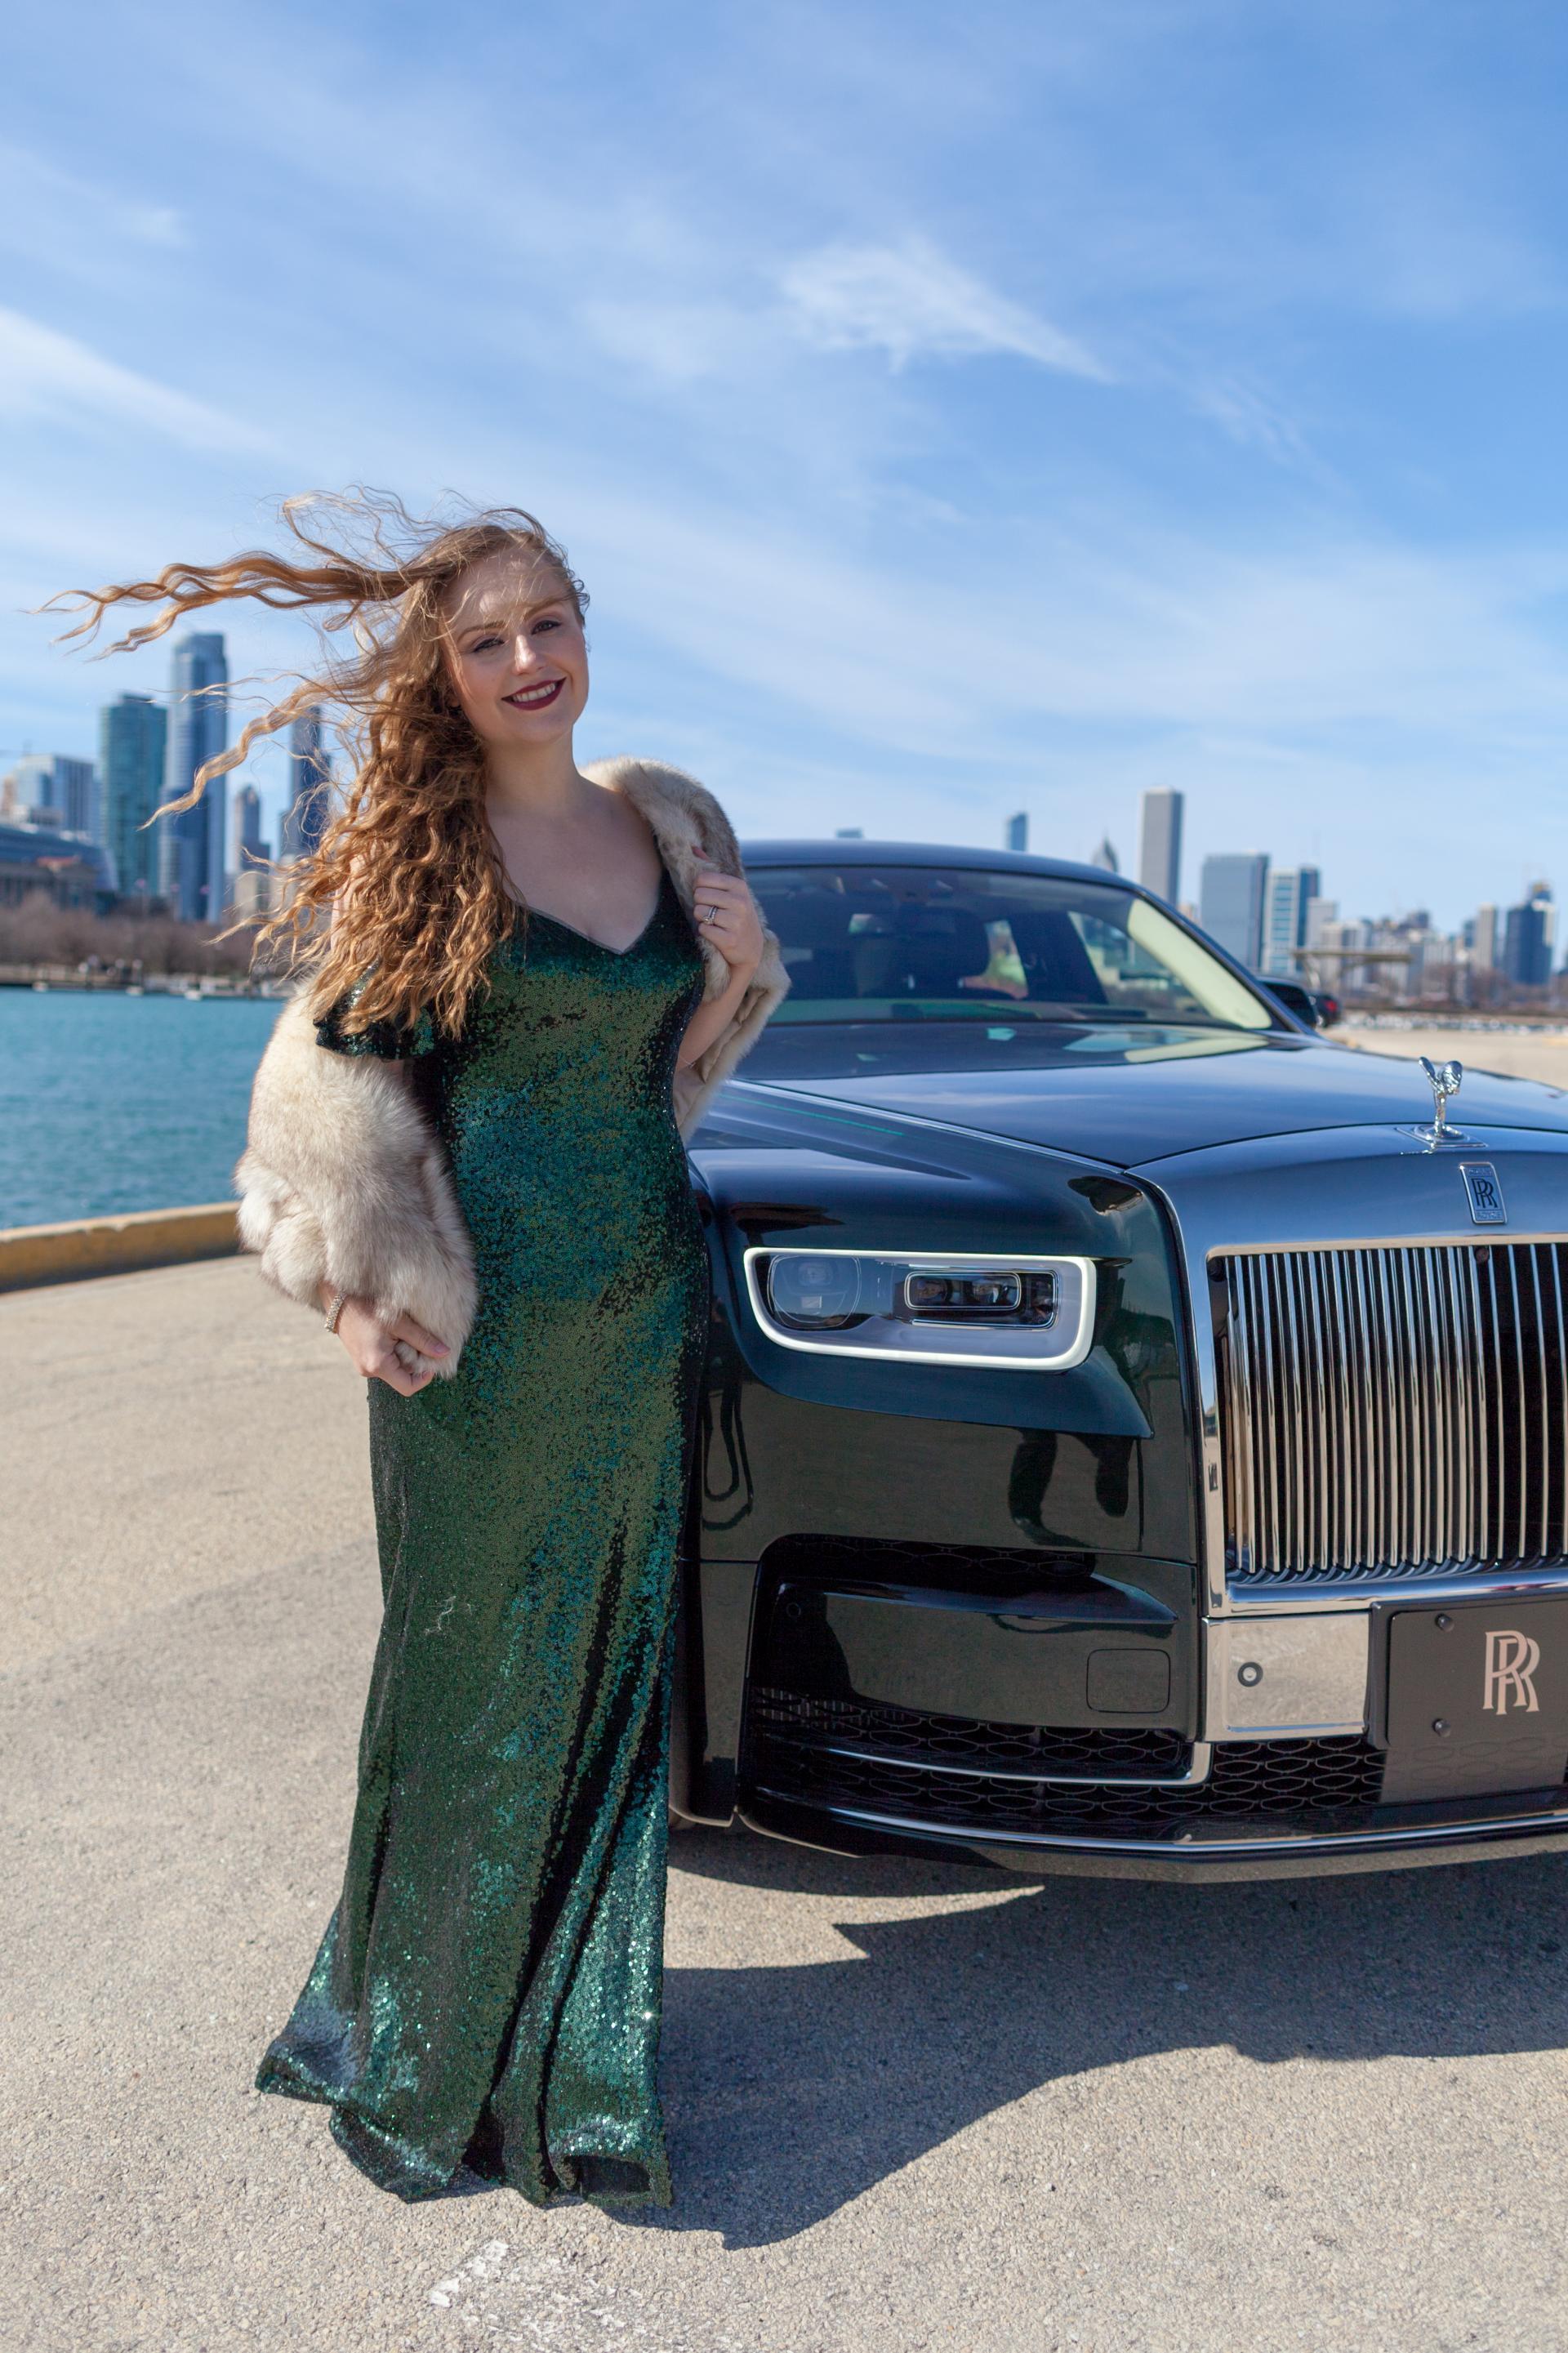 The Peninsula Chicago x Rolls-Royce